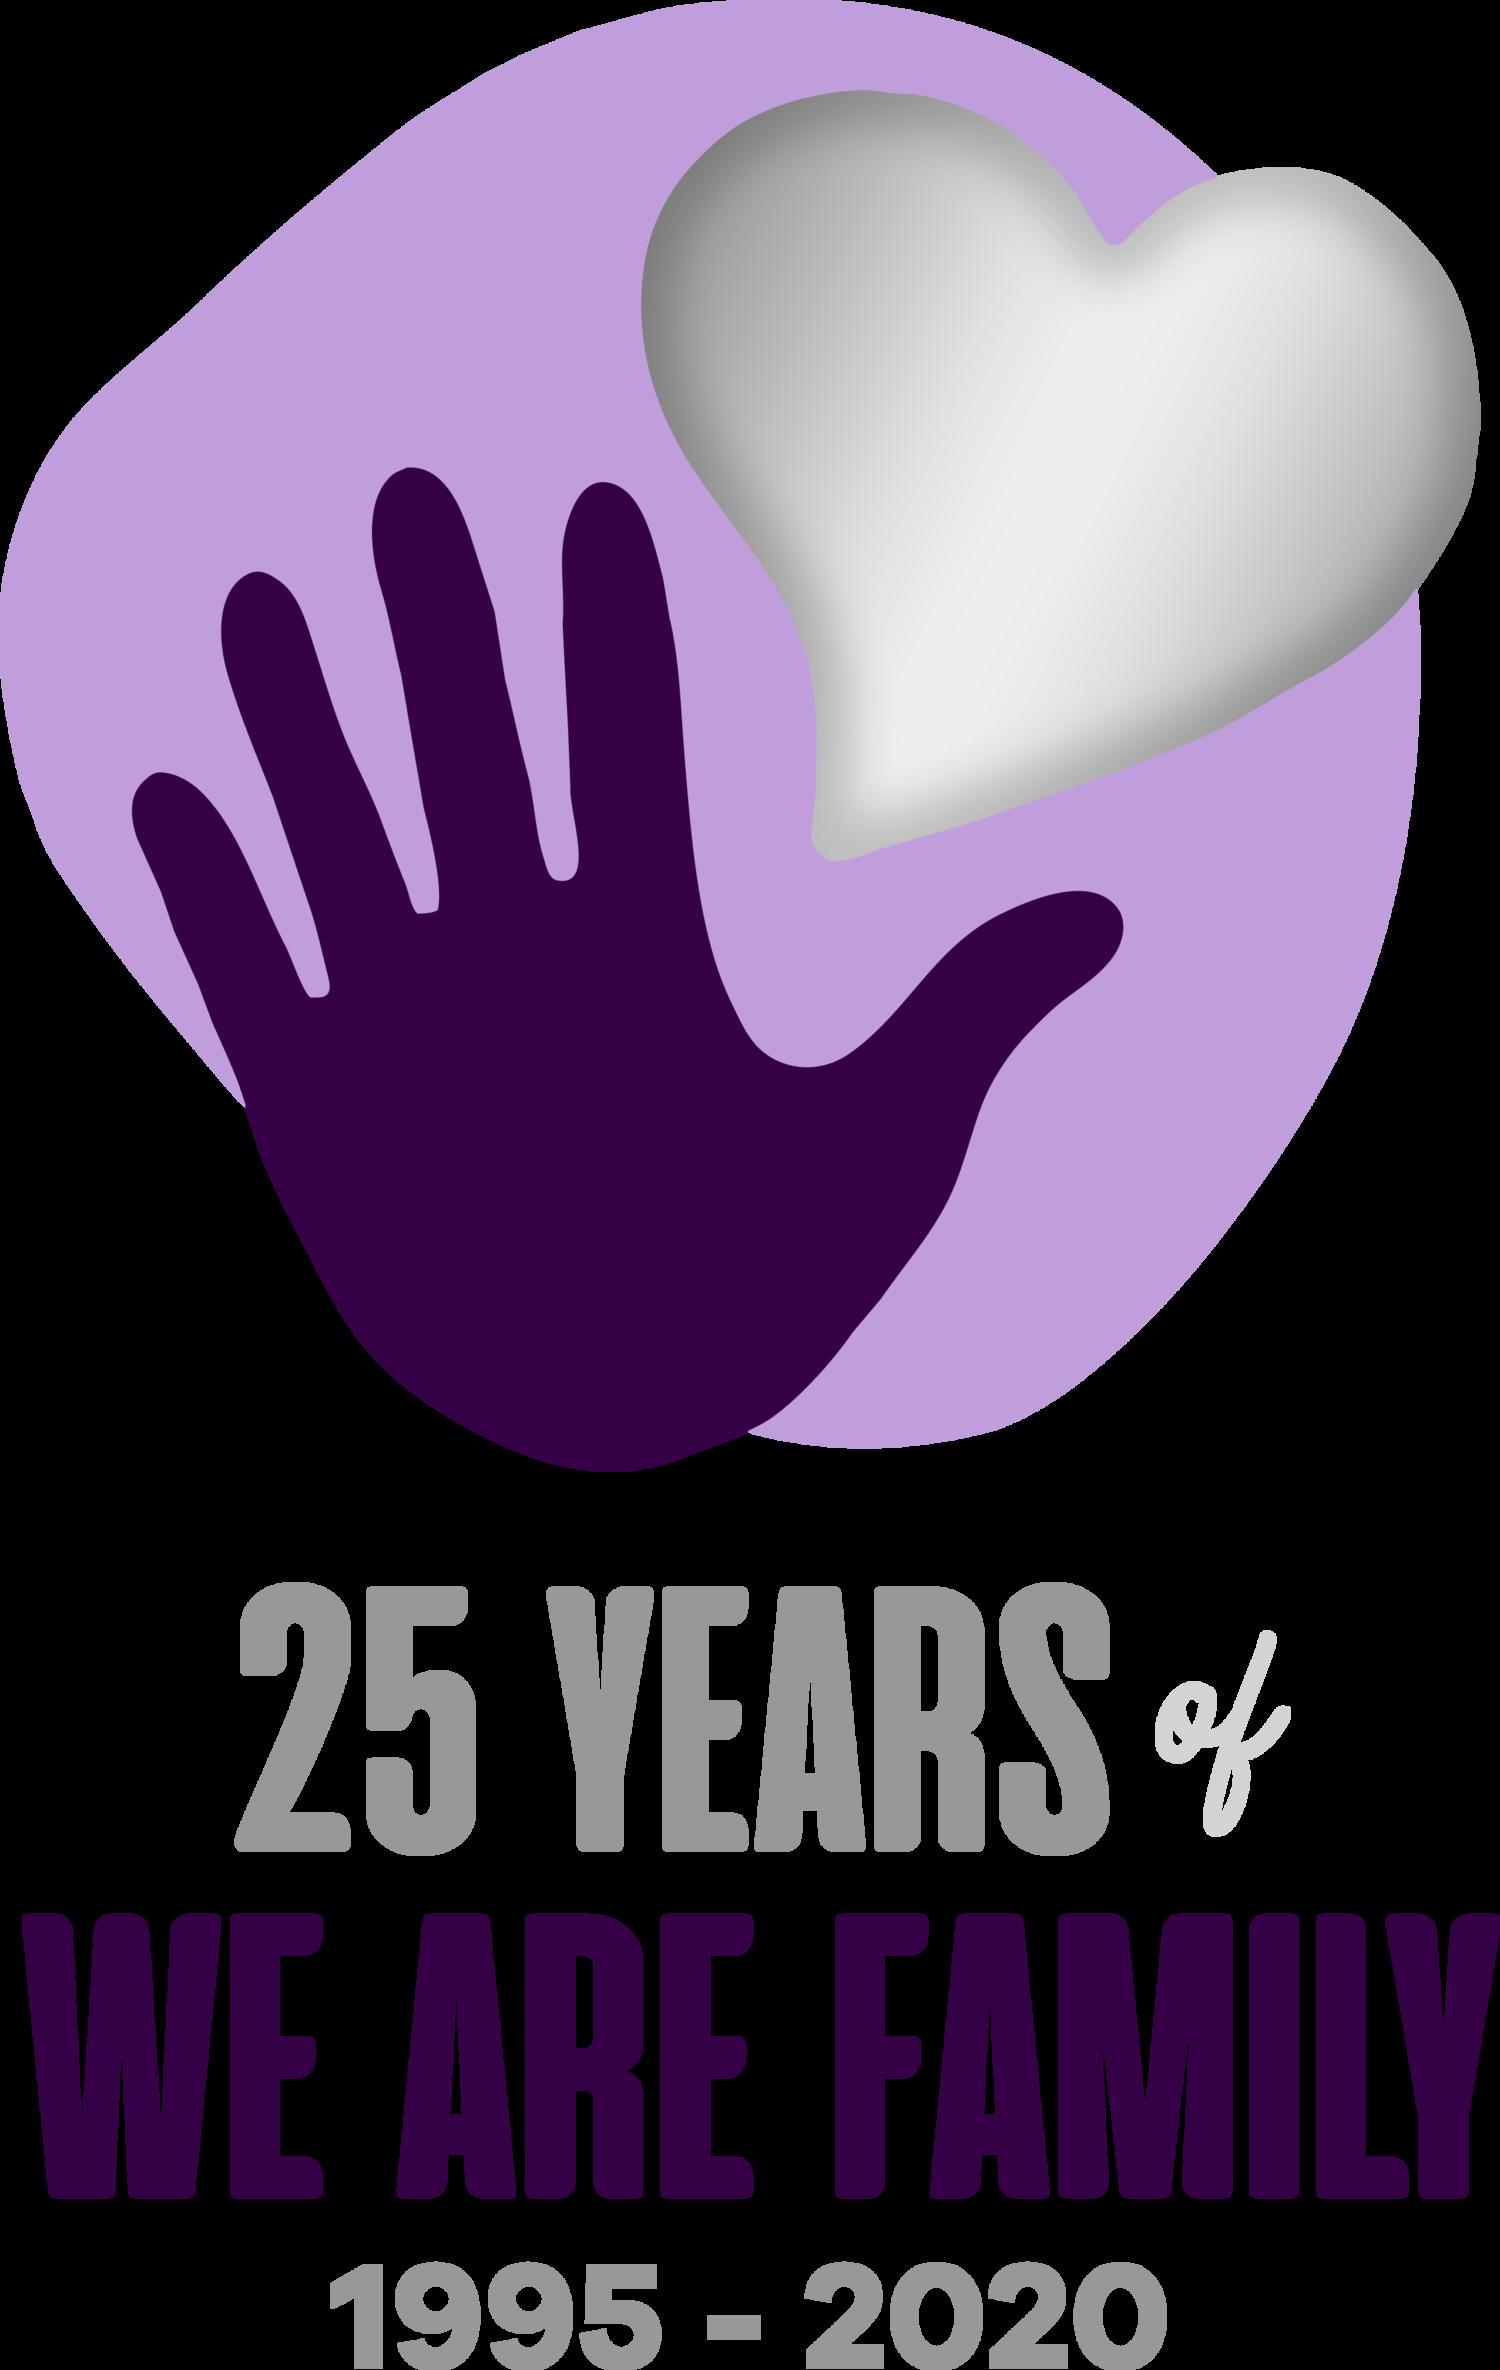 We Are Family Charleston hand and heart logo